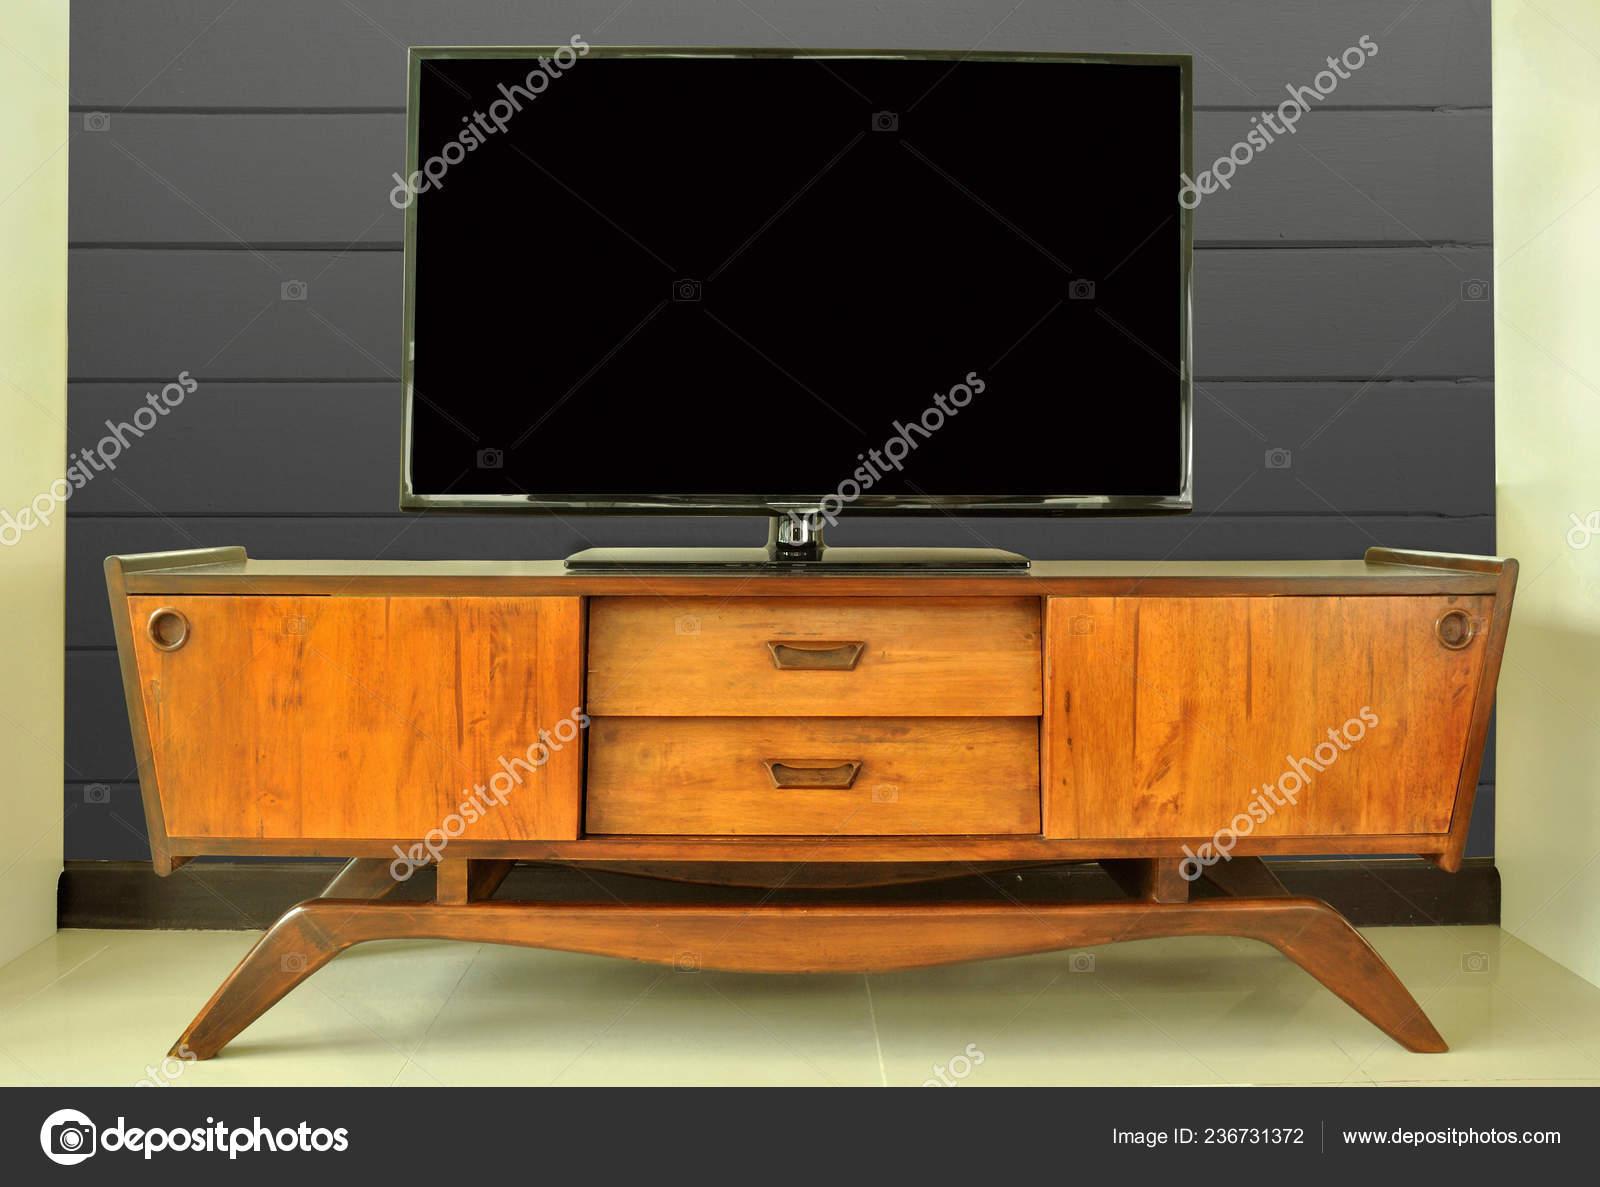 Retro Teak Tv Kast.Teak Retro Television Cabinet Room Dark Wall Stock Photo